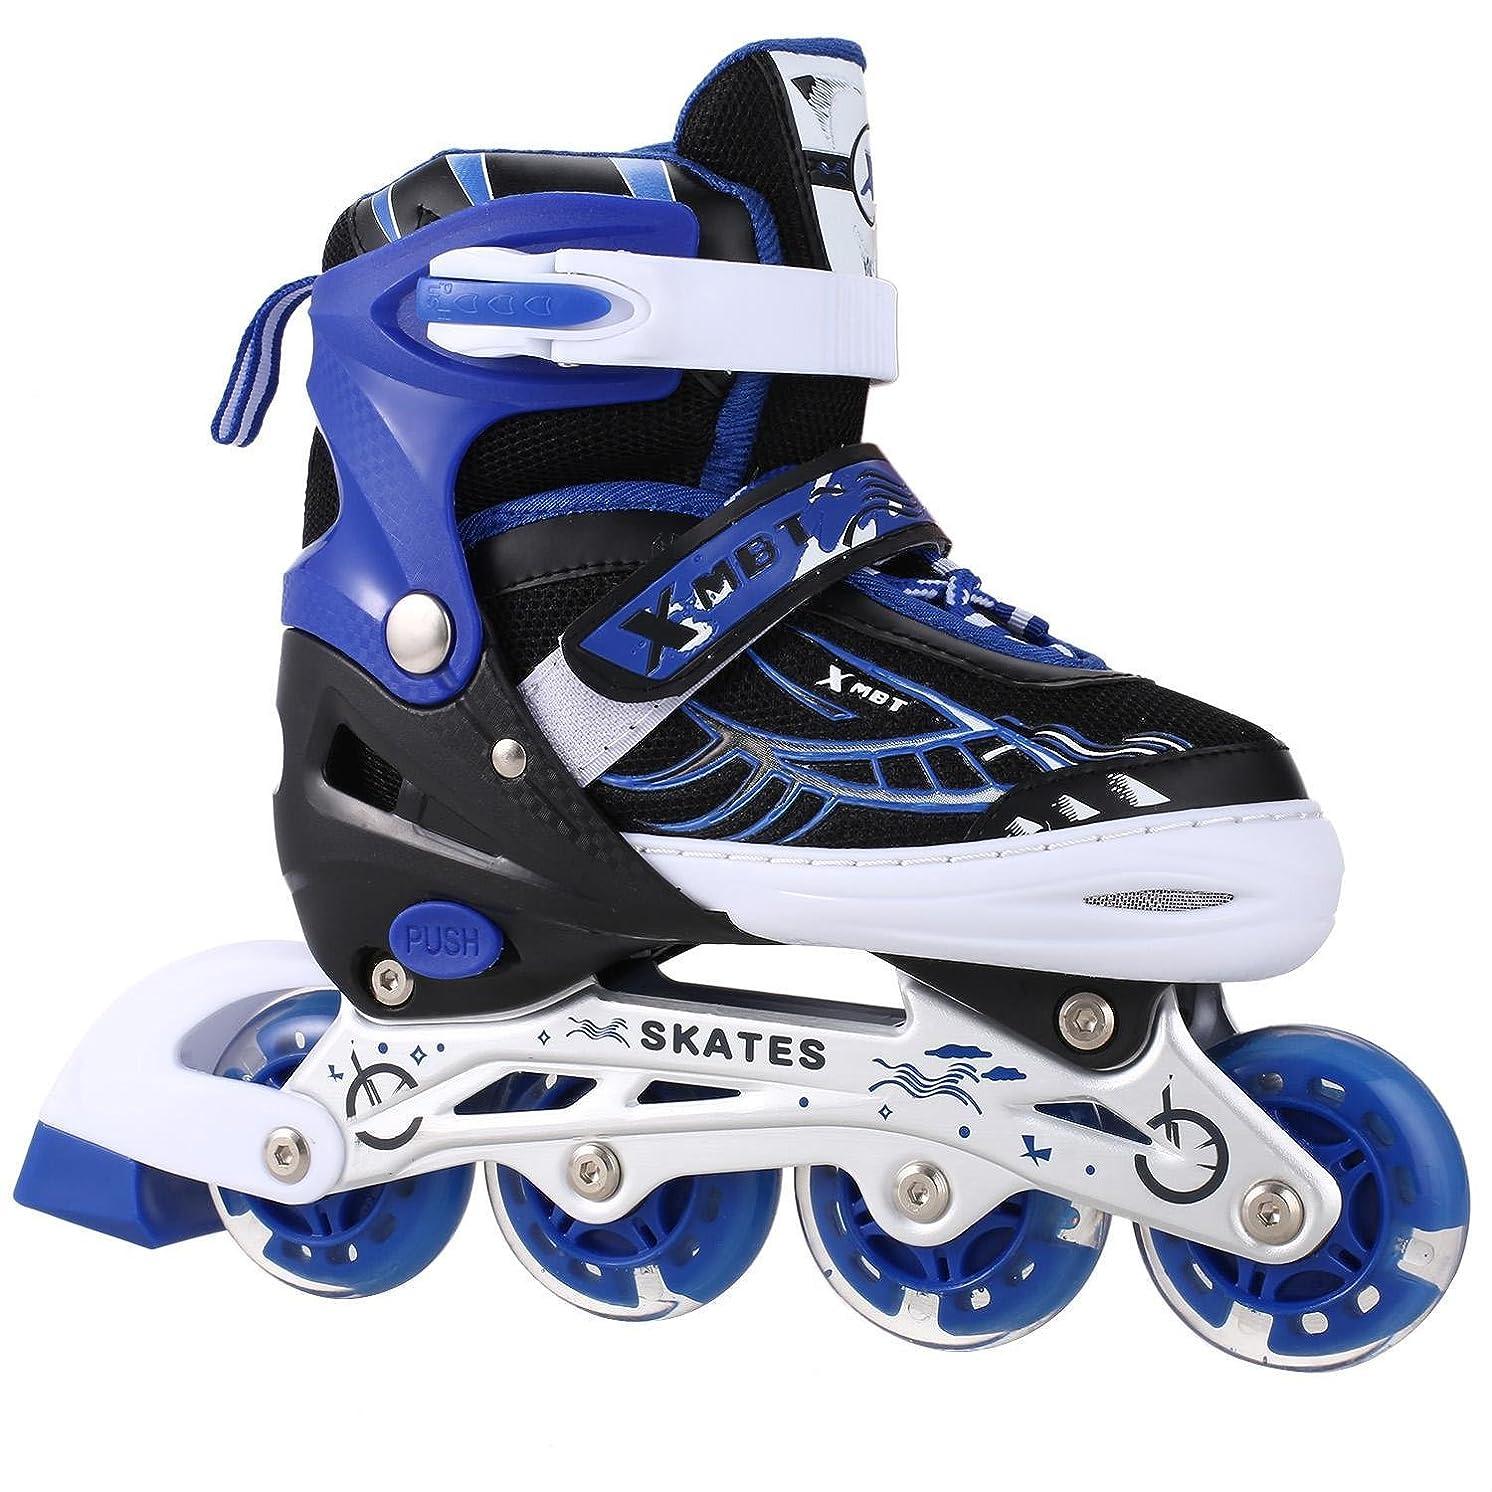 Dorani Unisex Children PU Wheel PP Material Indoor Outdoor Roller Blades Girls Boys Tracer Adjustable Inline Skate (US Stock)